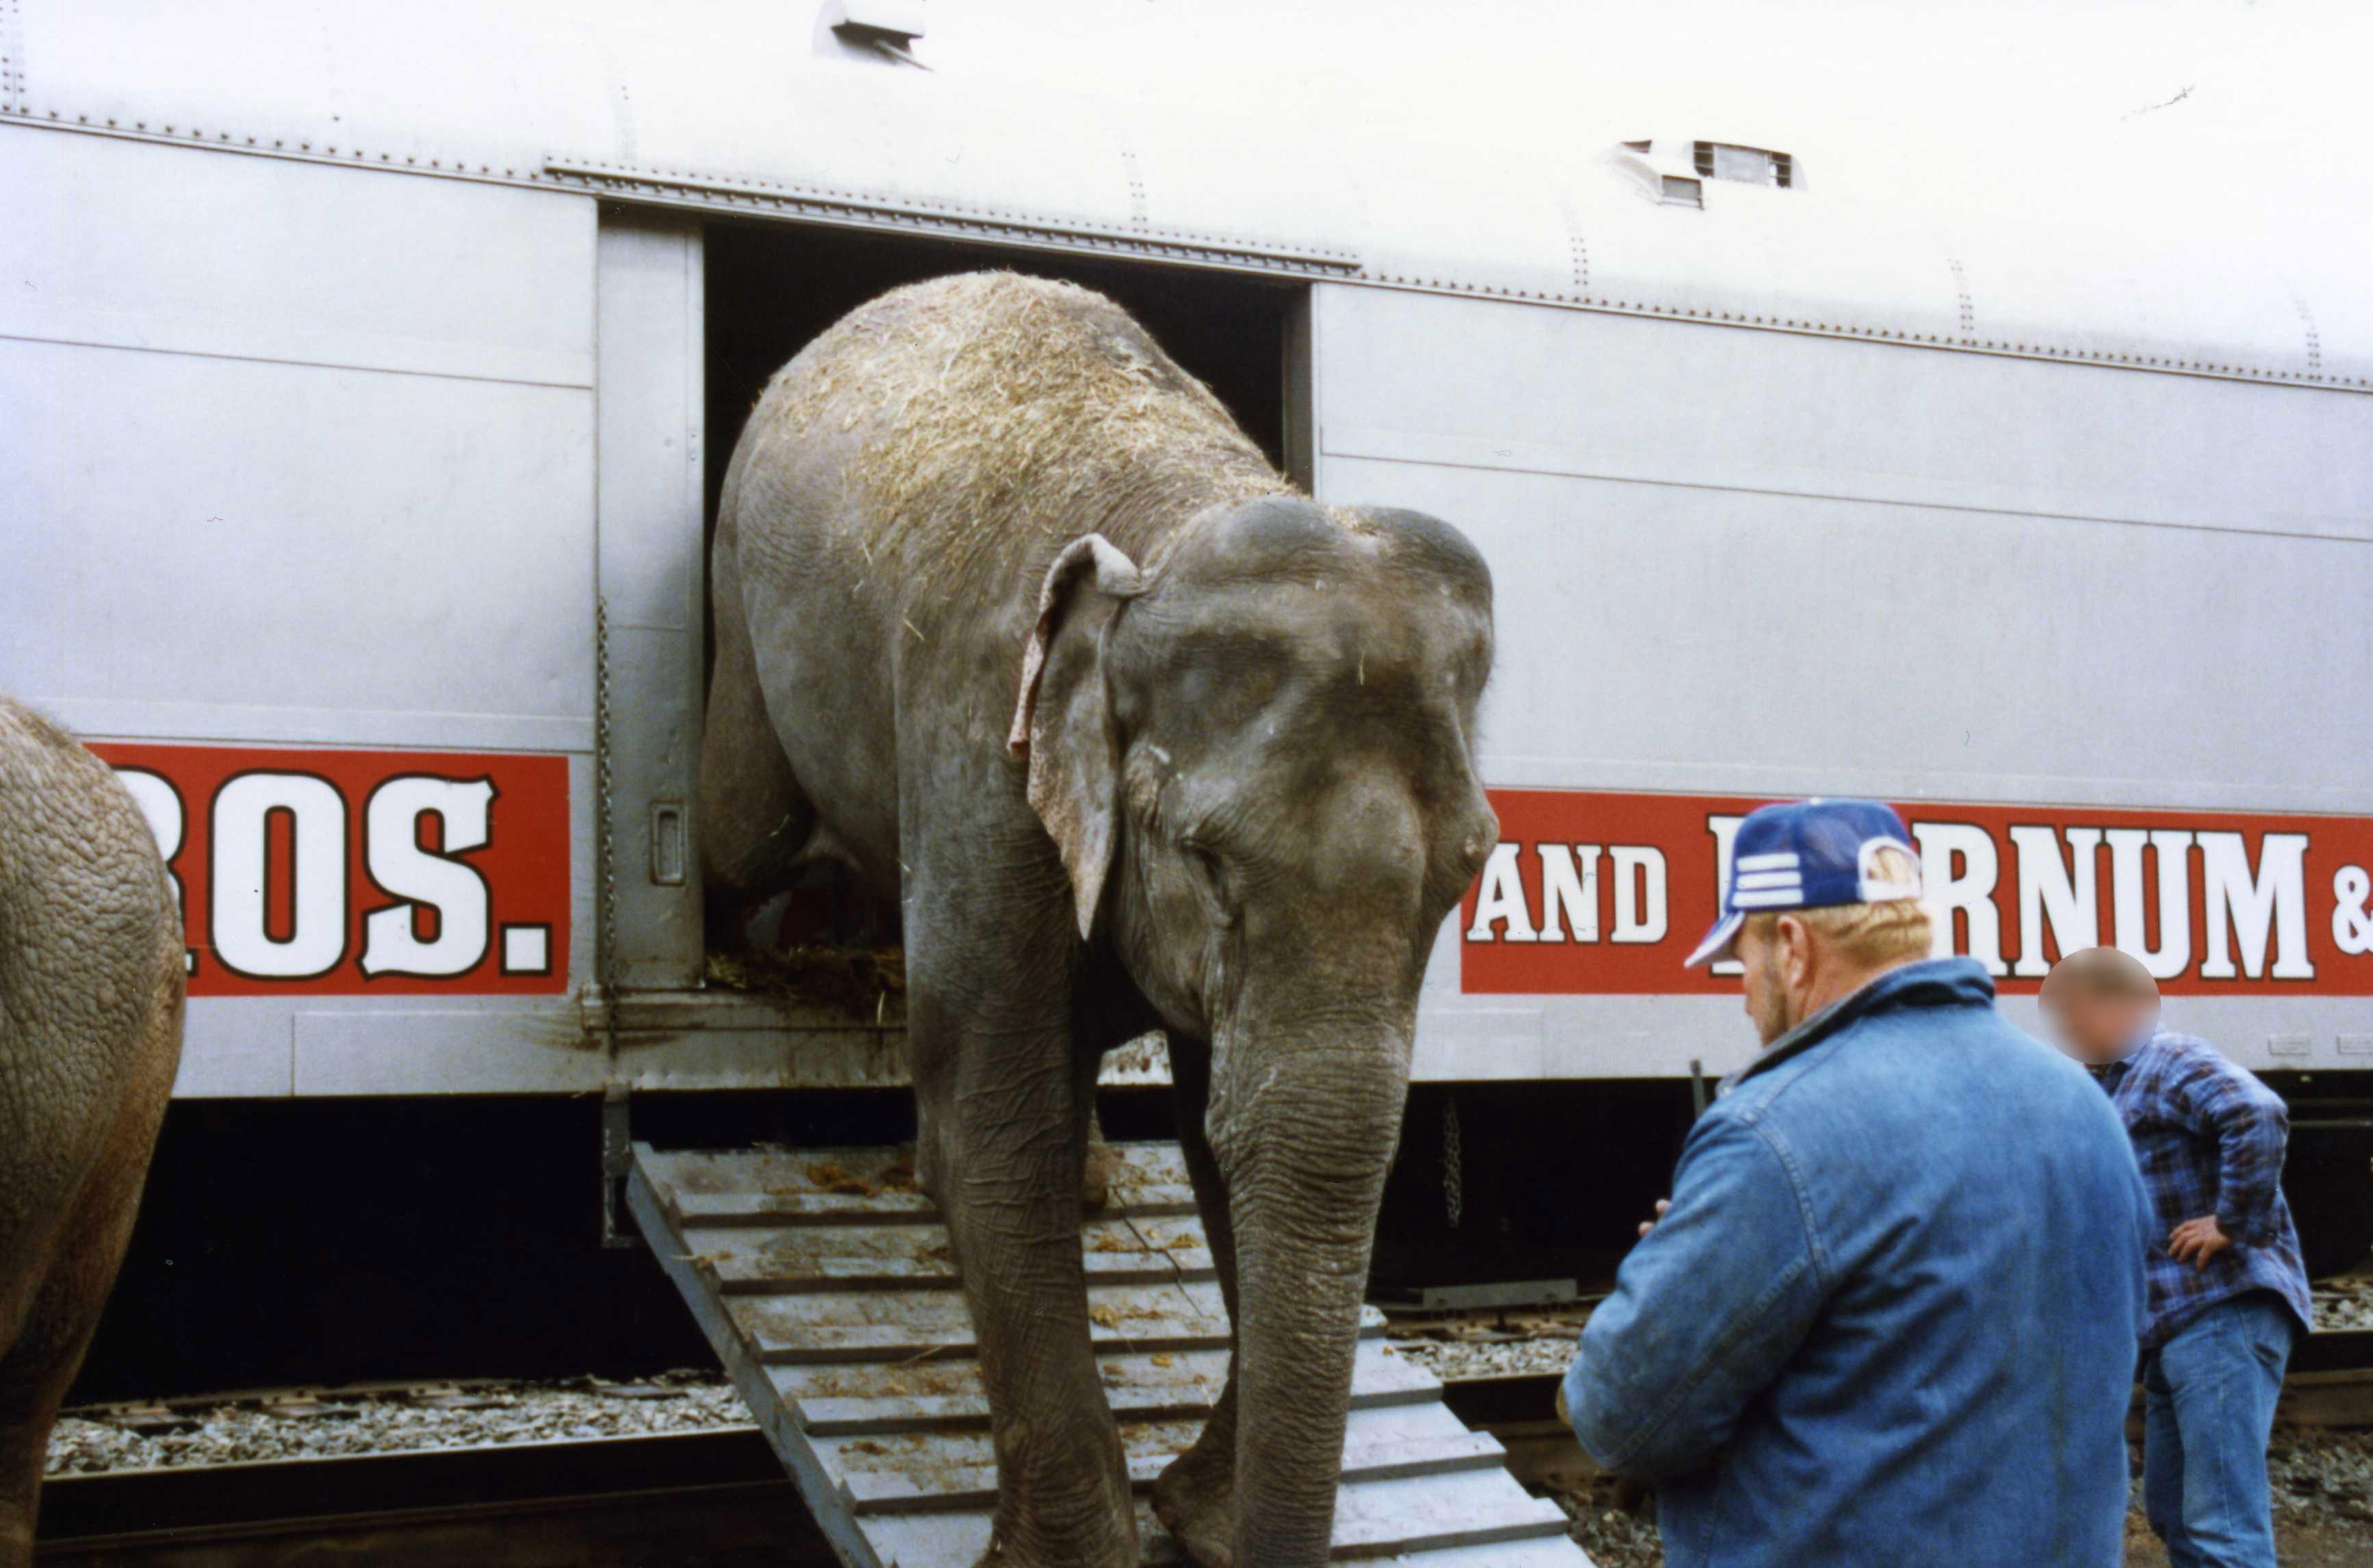 circus elephants leaving box car